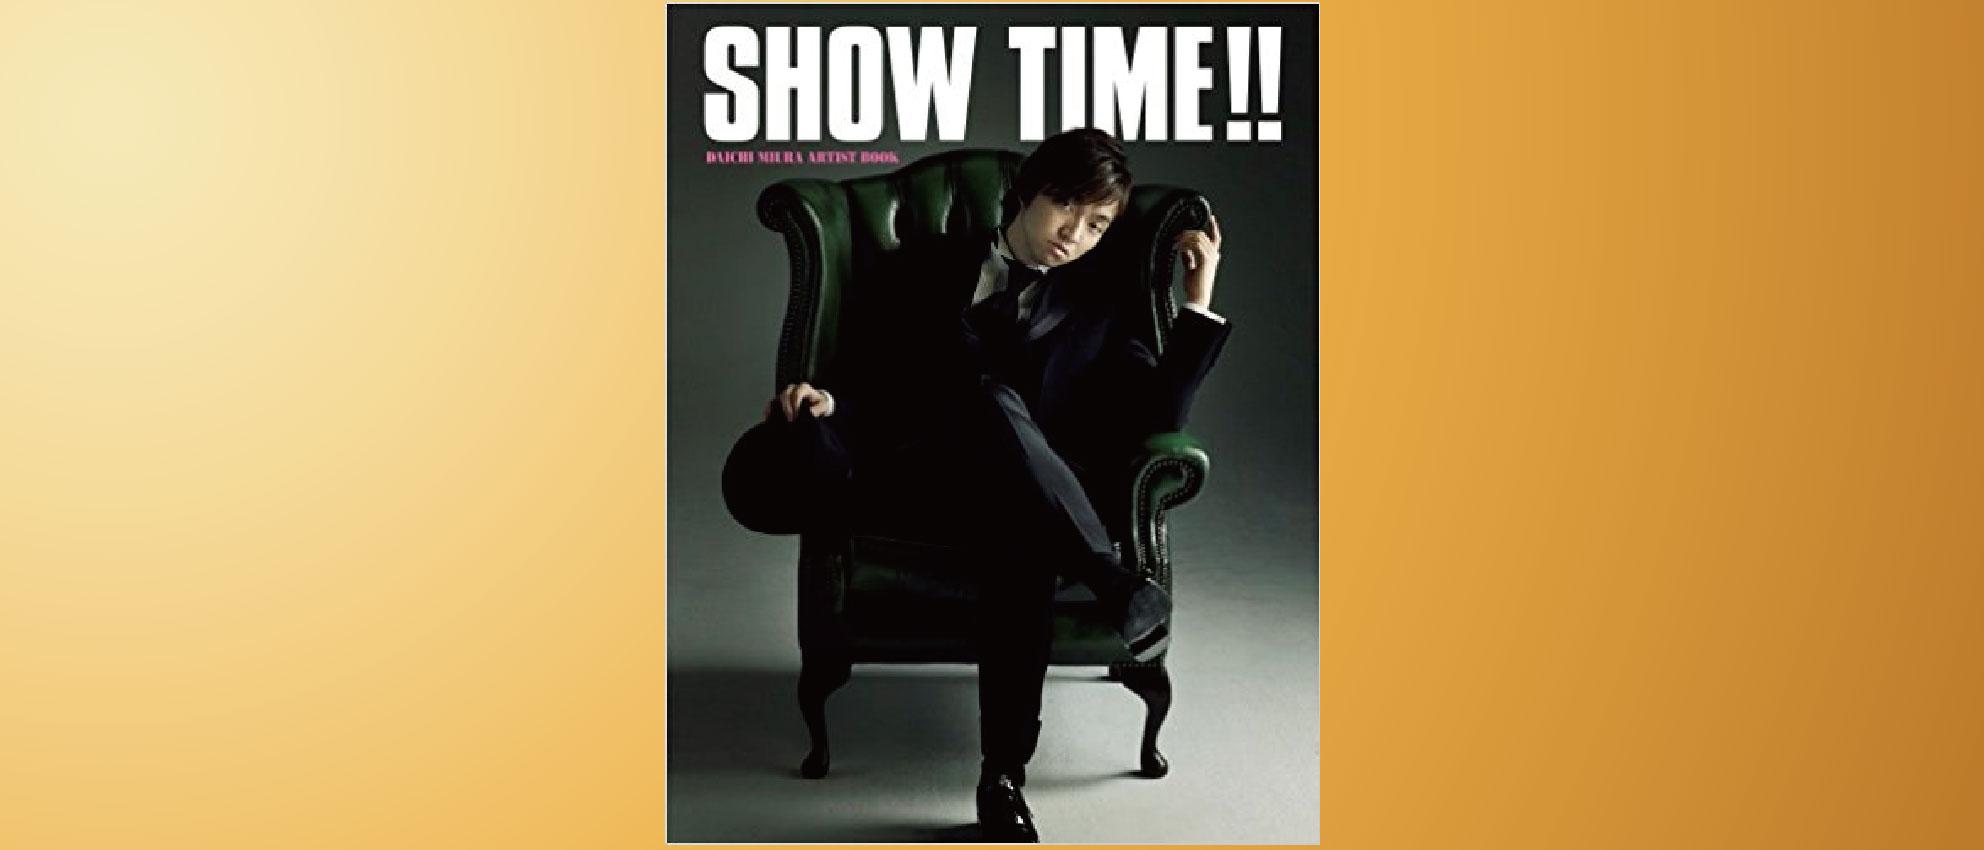 『SHOW TIME!!』(エムオン・エンタテインメント)待望の重版出来!